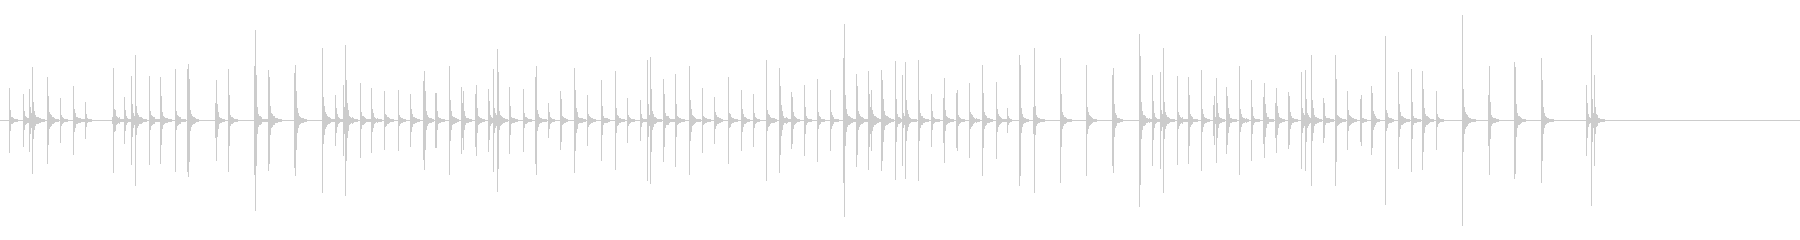 木琴6歌舞伎黒御簾下座音楽和風日本マリンの未再生の波形